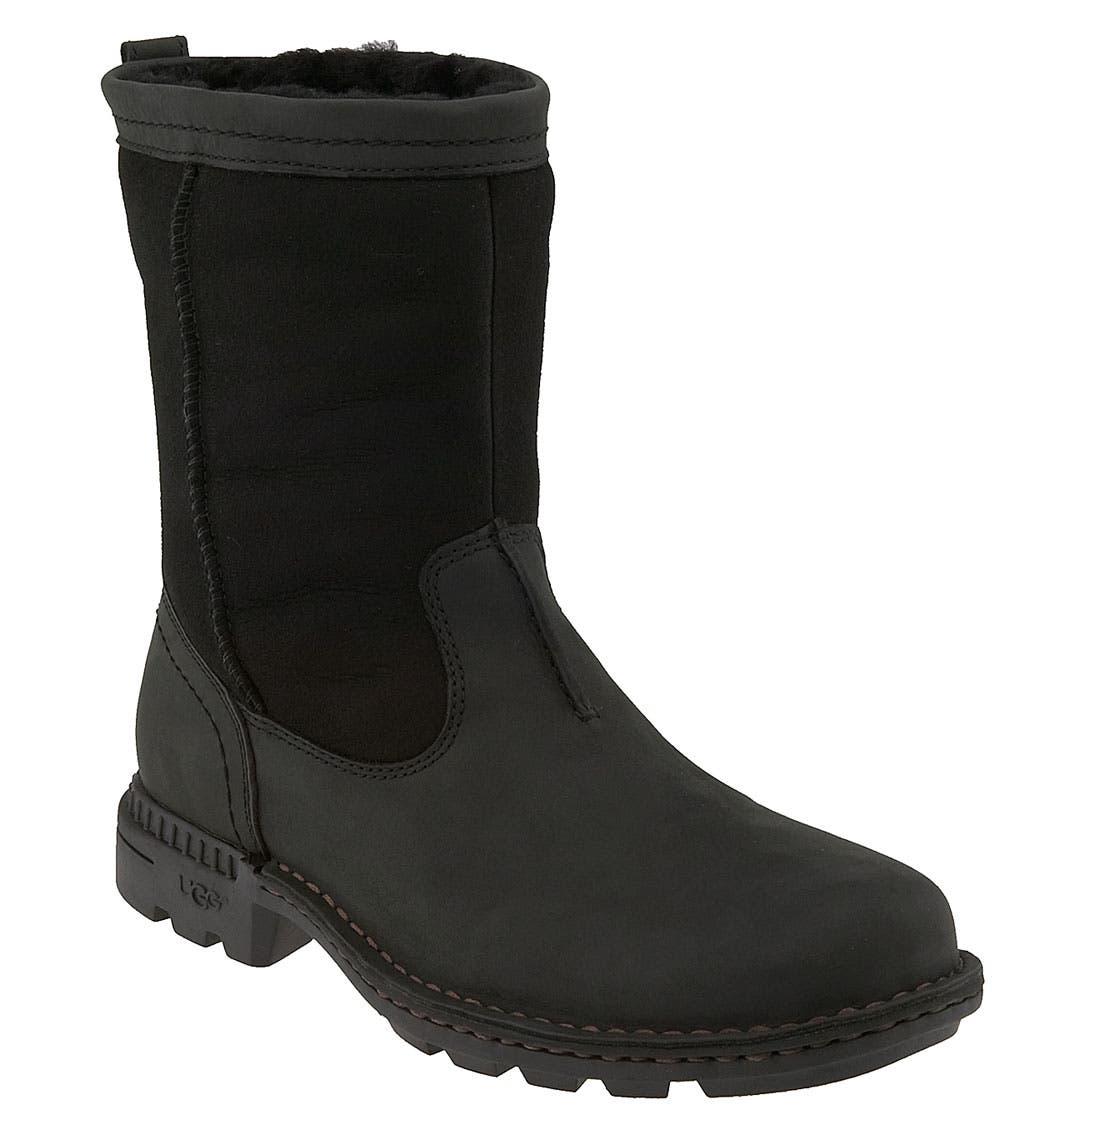 Alternate Image 1 Selected - UGG® 'Hartsville' Boot (Men)